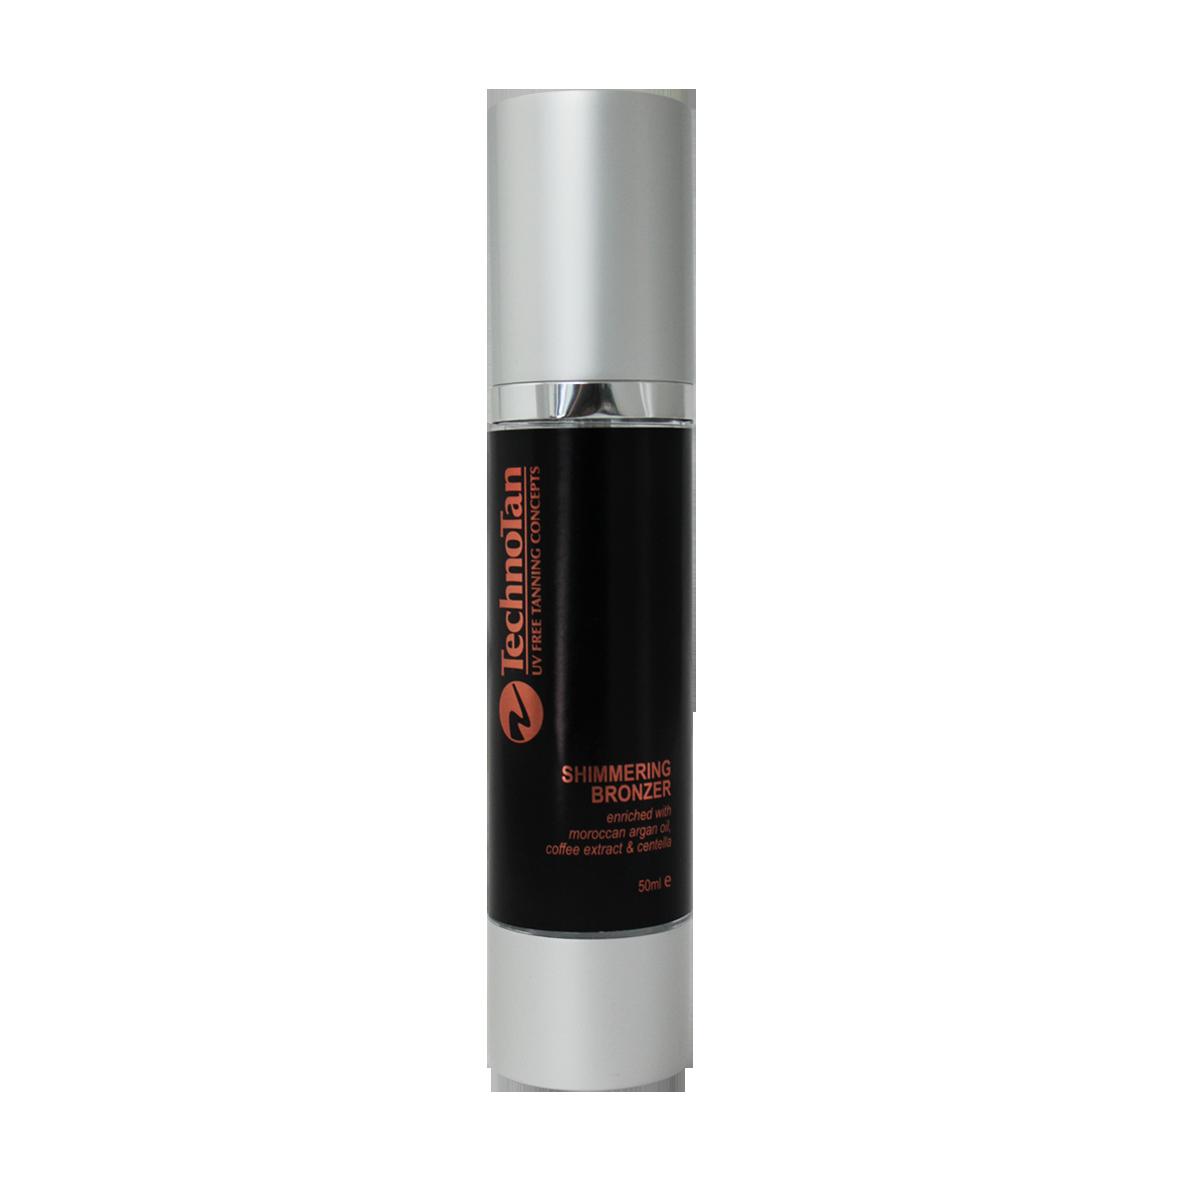 Shimmering Bronzer - Tamarillo & Papaya - 50ml (airless pump)